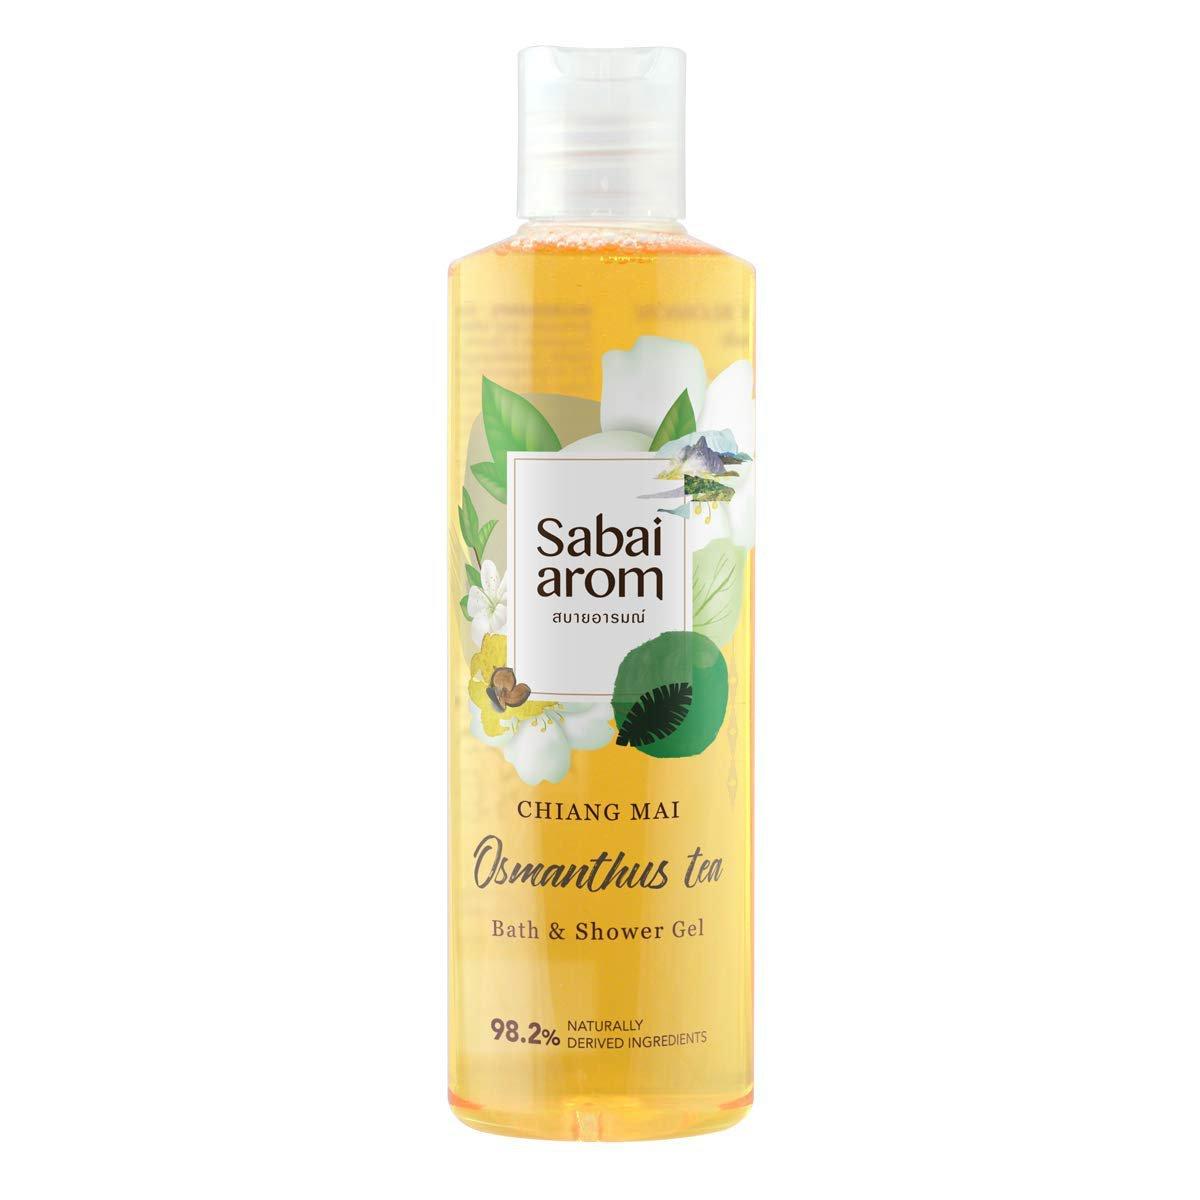 Sabai-arom Osmanthus Tea Bath & Shower Gel 250 ml. (4 Pack)